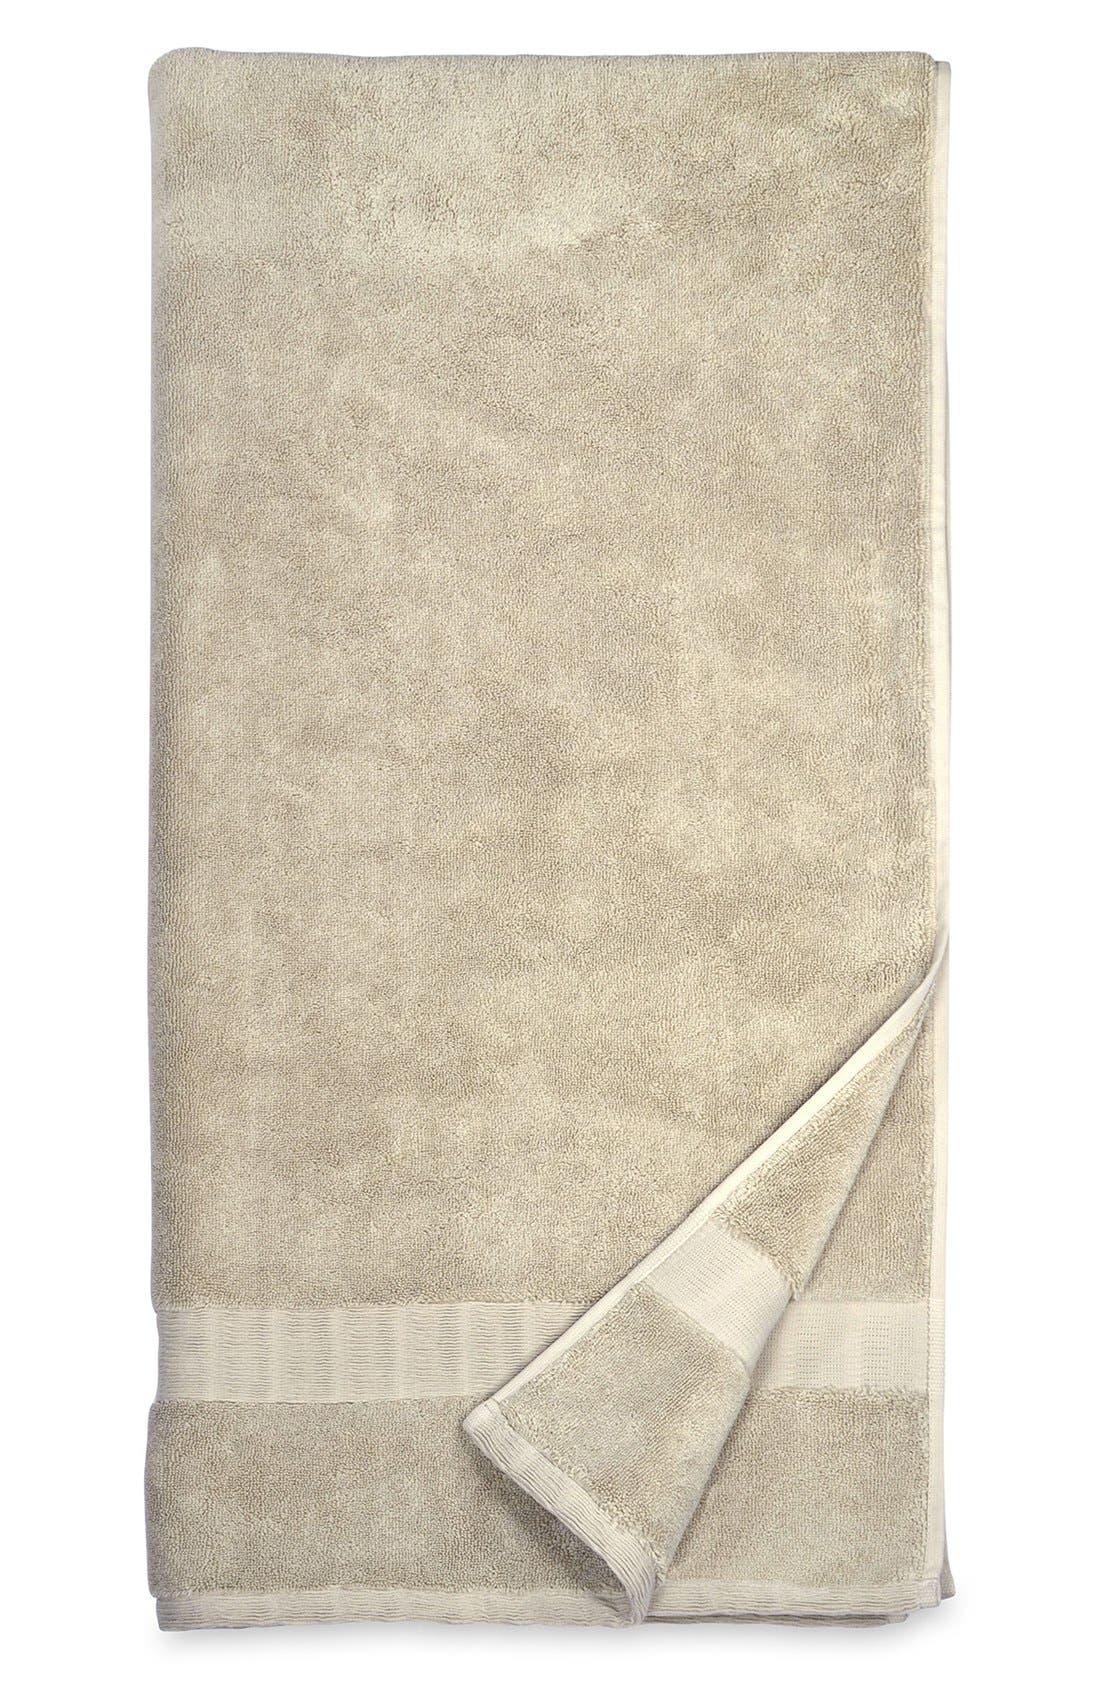 DKNY Mercer Bath Sheet